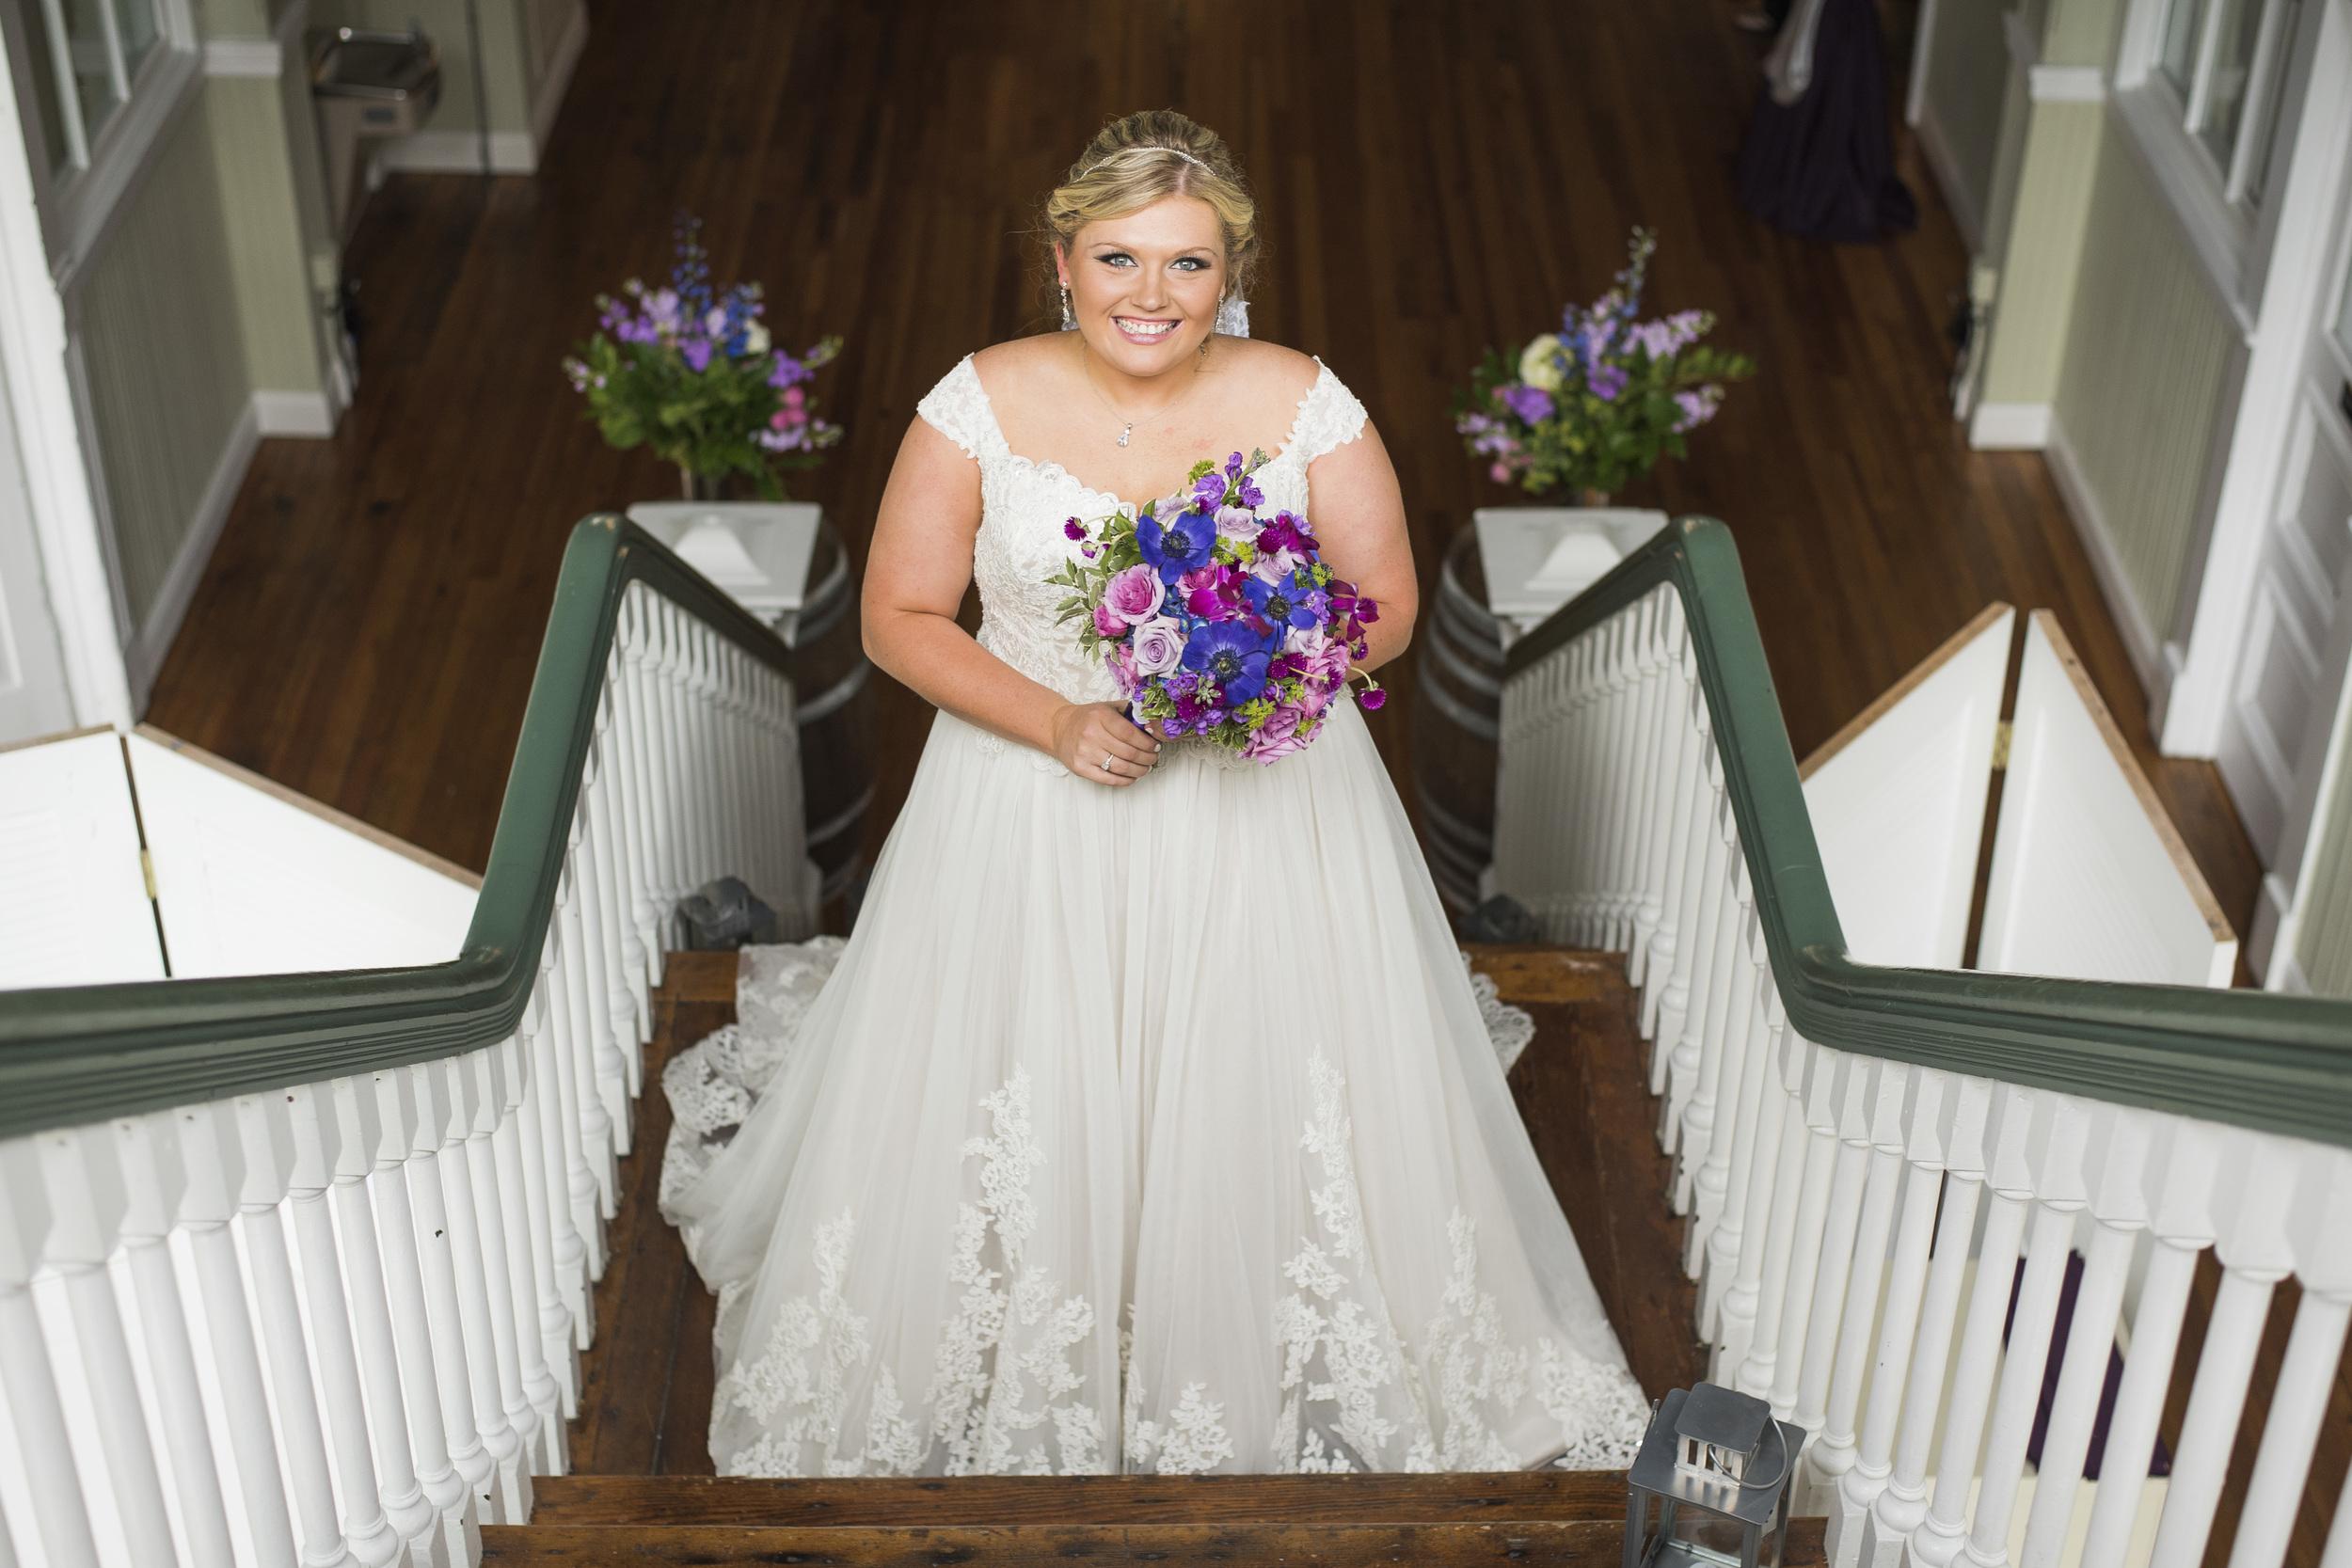 Lynchburg_VA_Wedding_Tresca on 8th_Downtown_Purple_elegant_Photos864.jpg